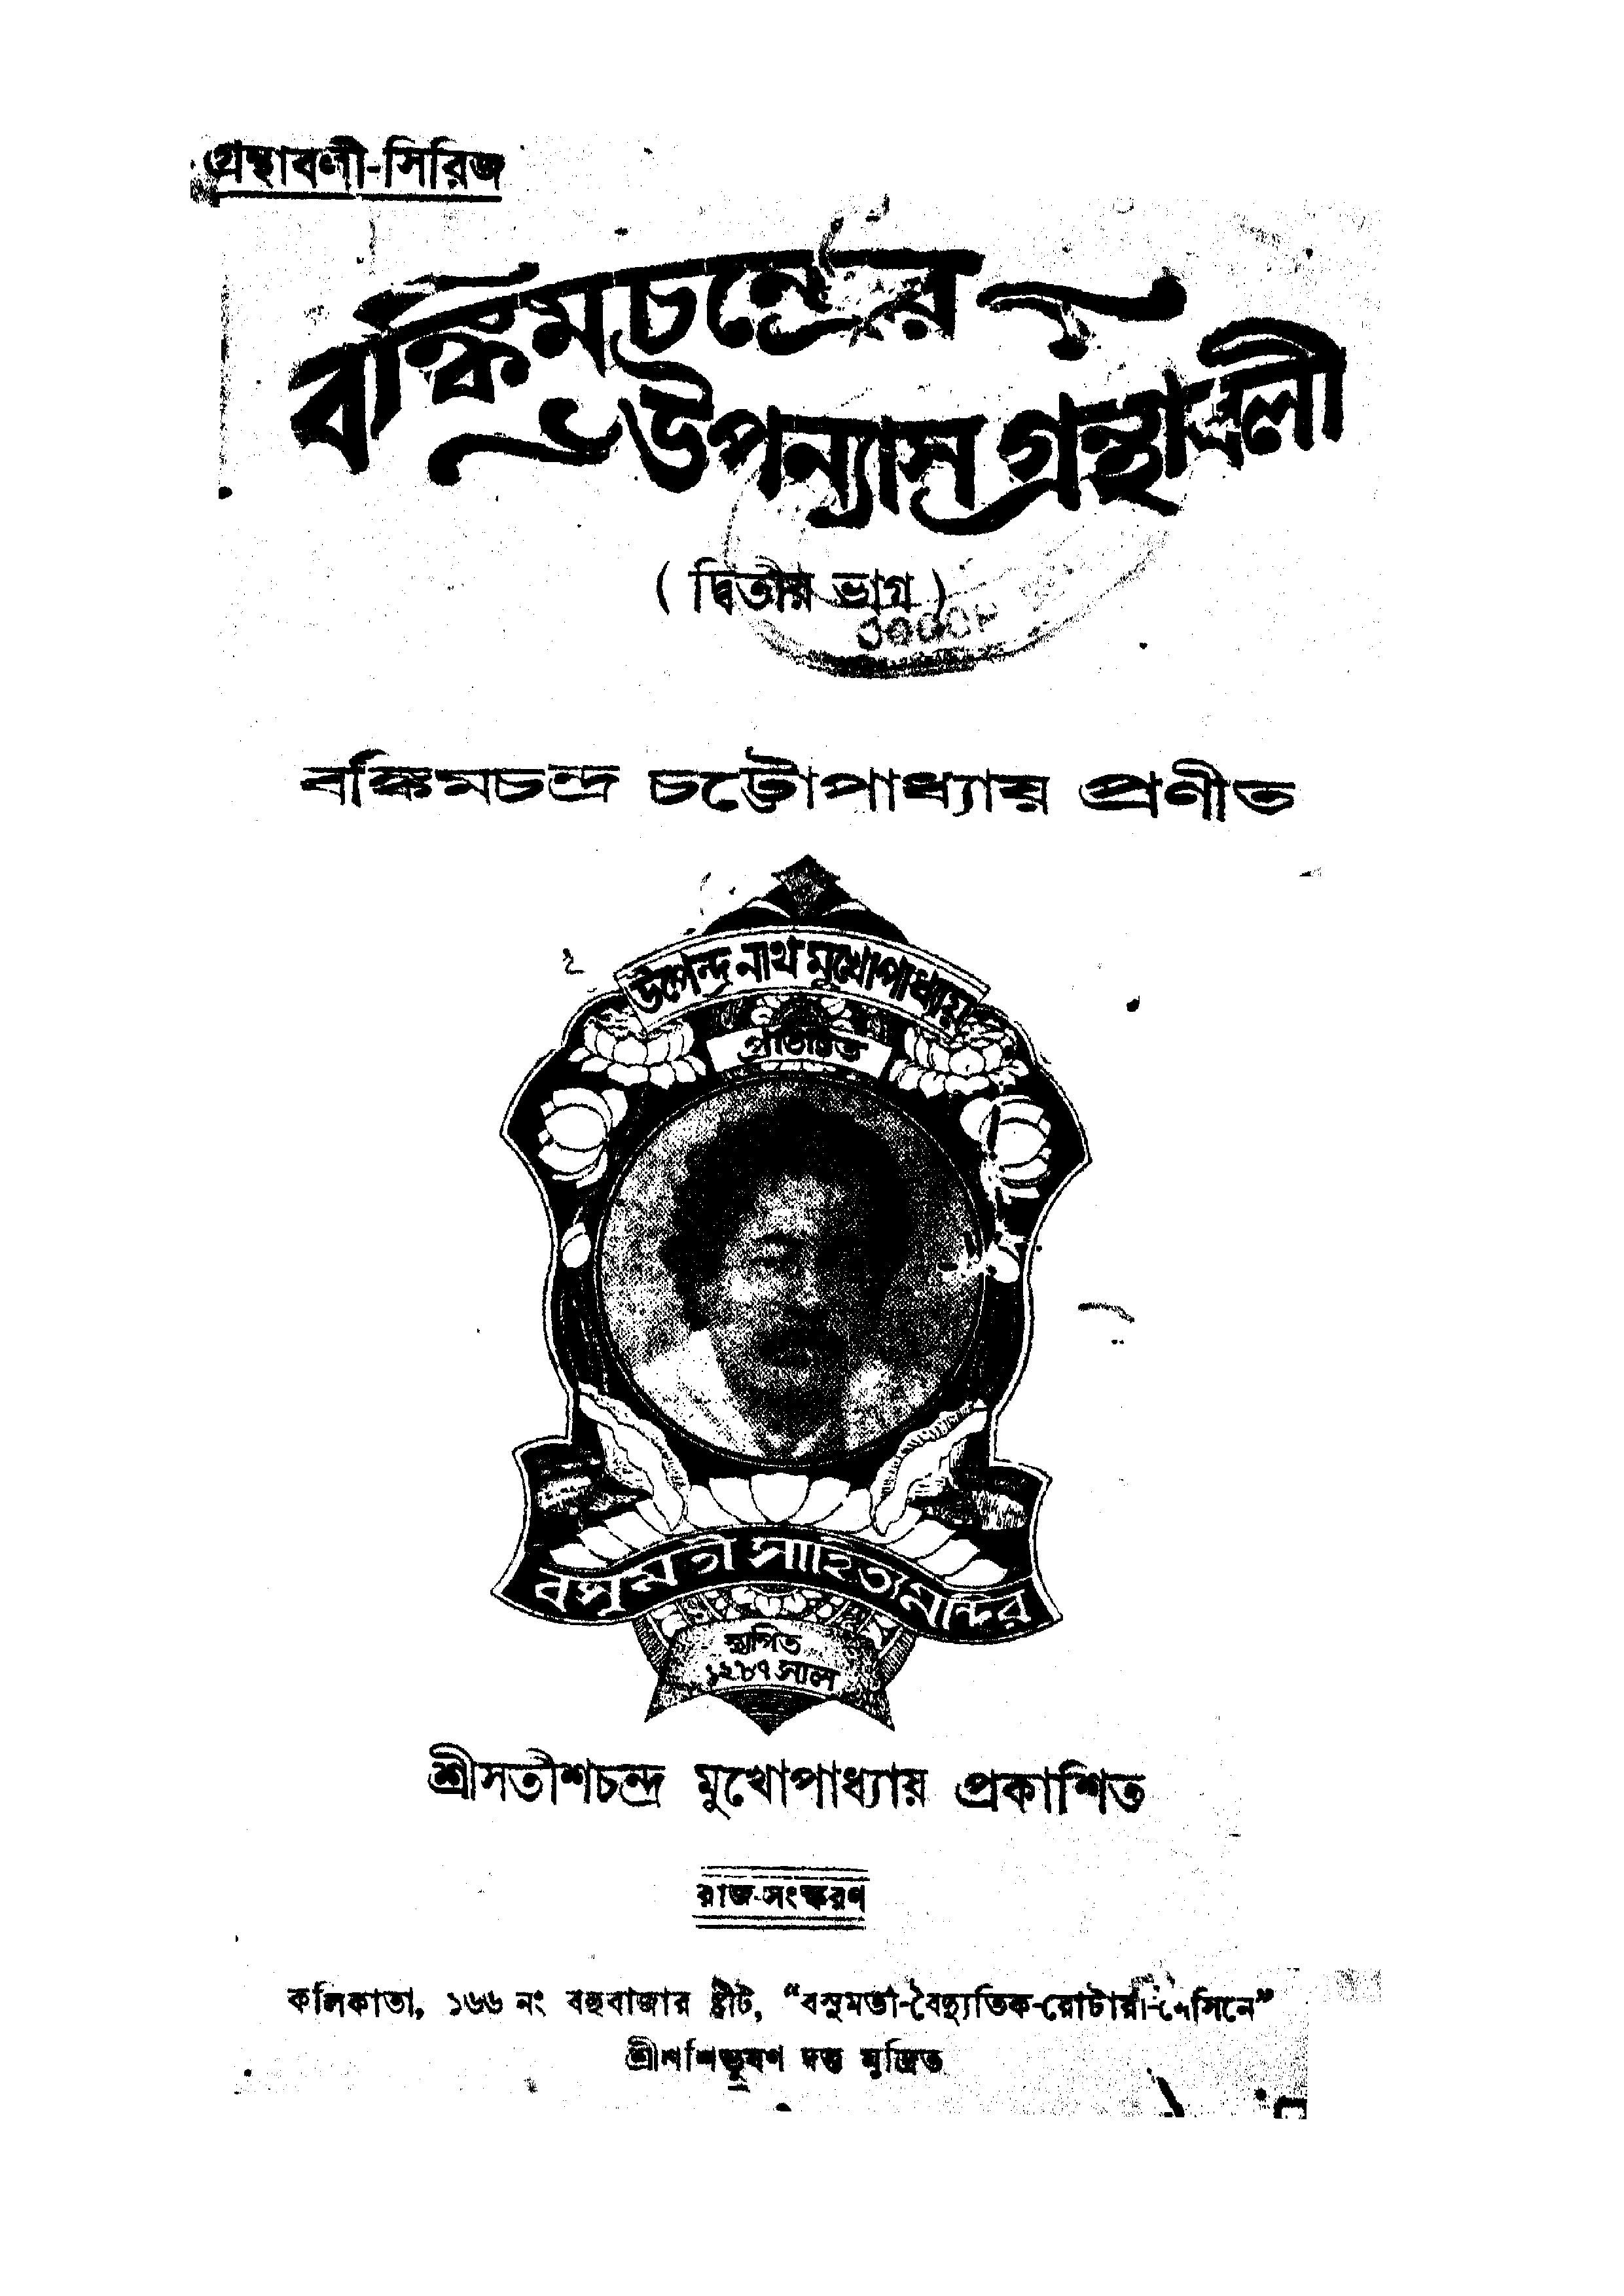 File4990010212237 Bankim Chandrer Upanyas Granthabali Vol 2 Original File Svg Nominally 573 X 444 Pixels Size 3508